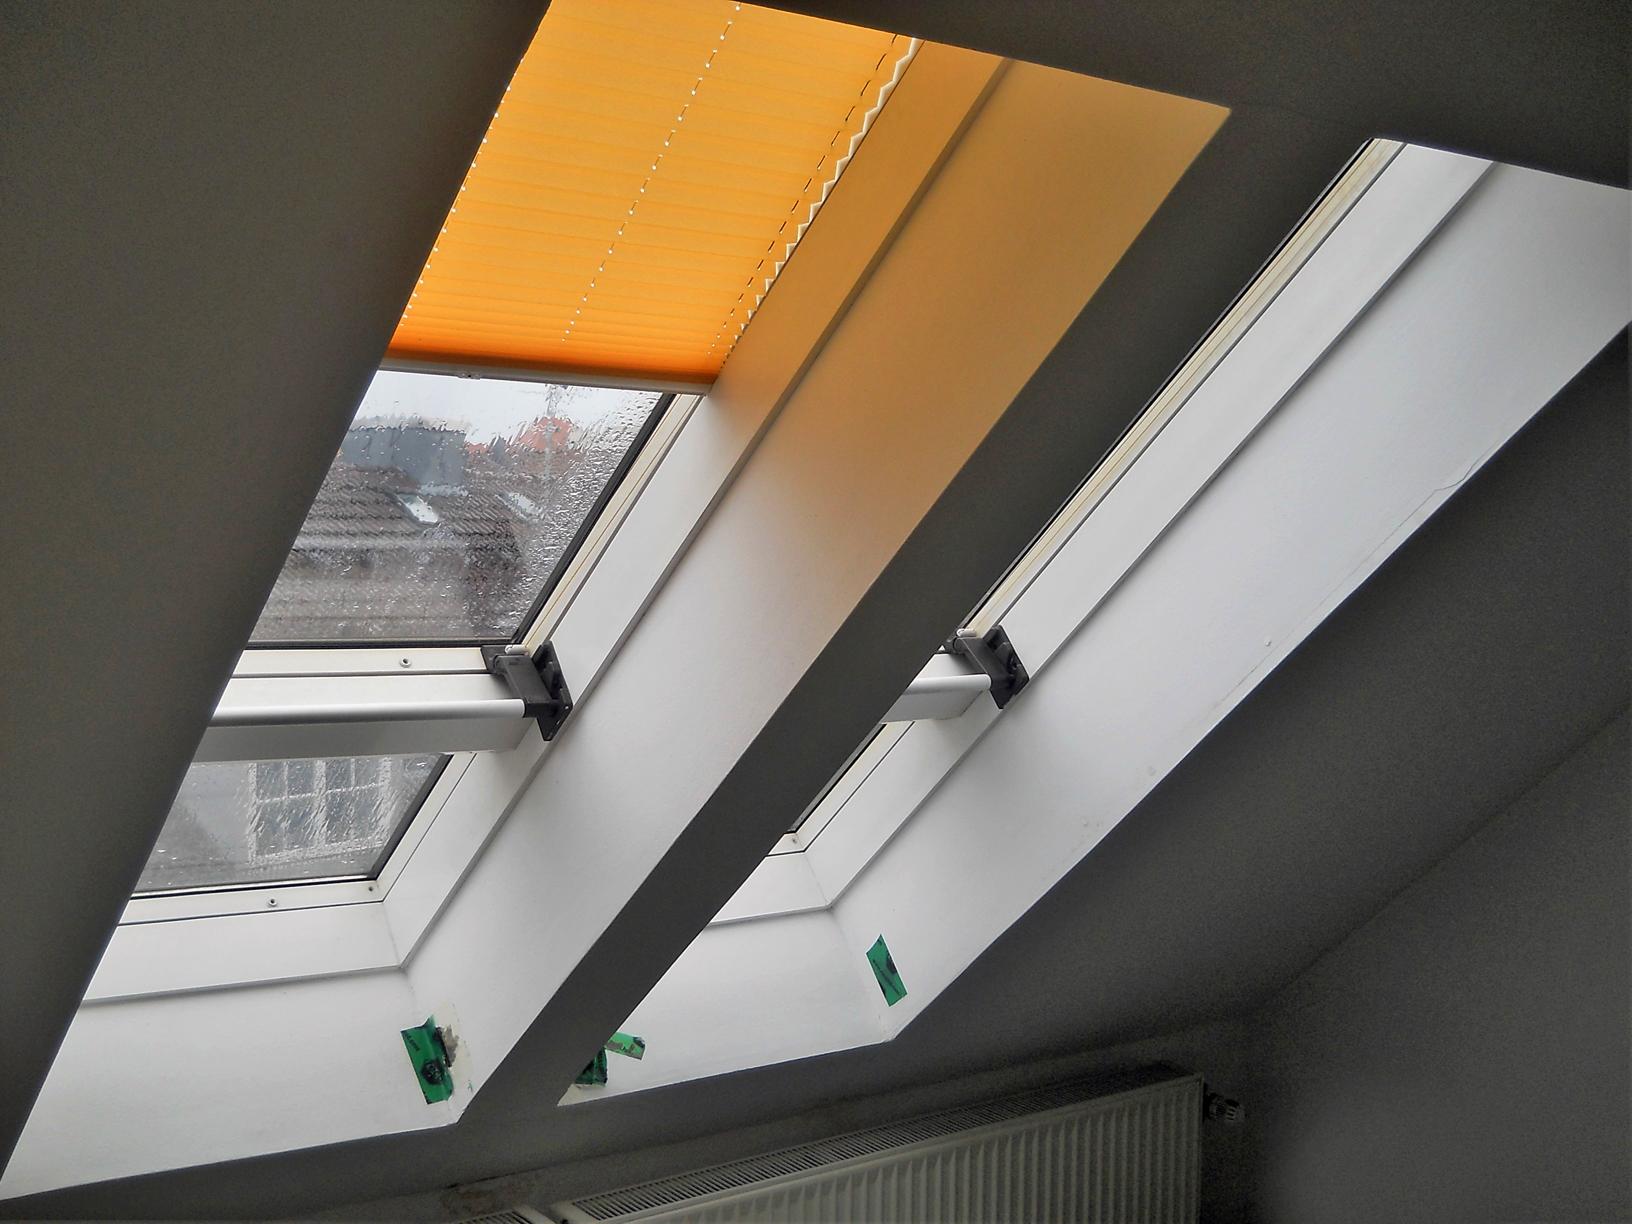 roto dachfenster undicht interesting finest dachfenster innenfutter cool velux rollo innen fur. Black Bedroom Furniture Sets. Home Design Ideas